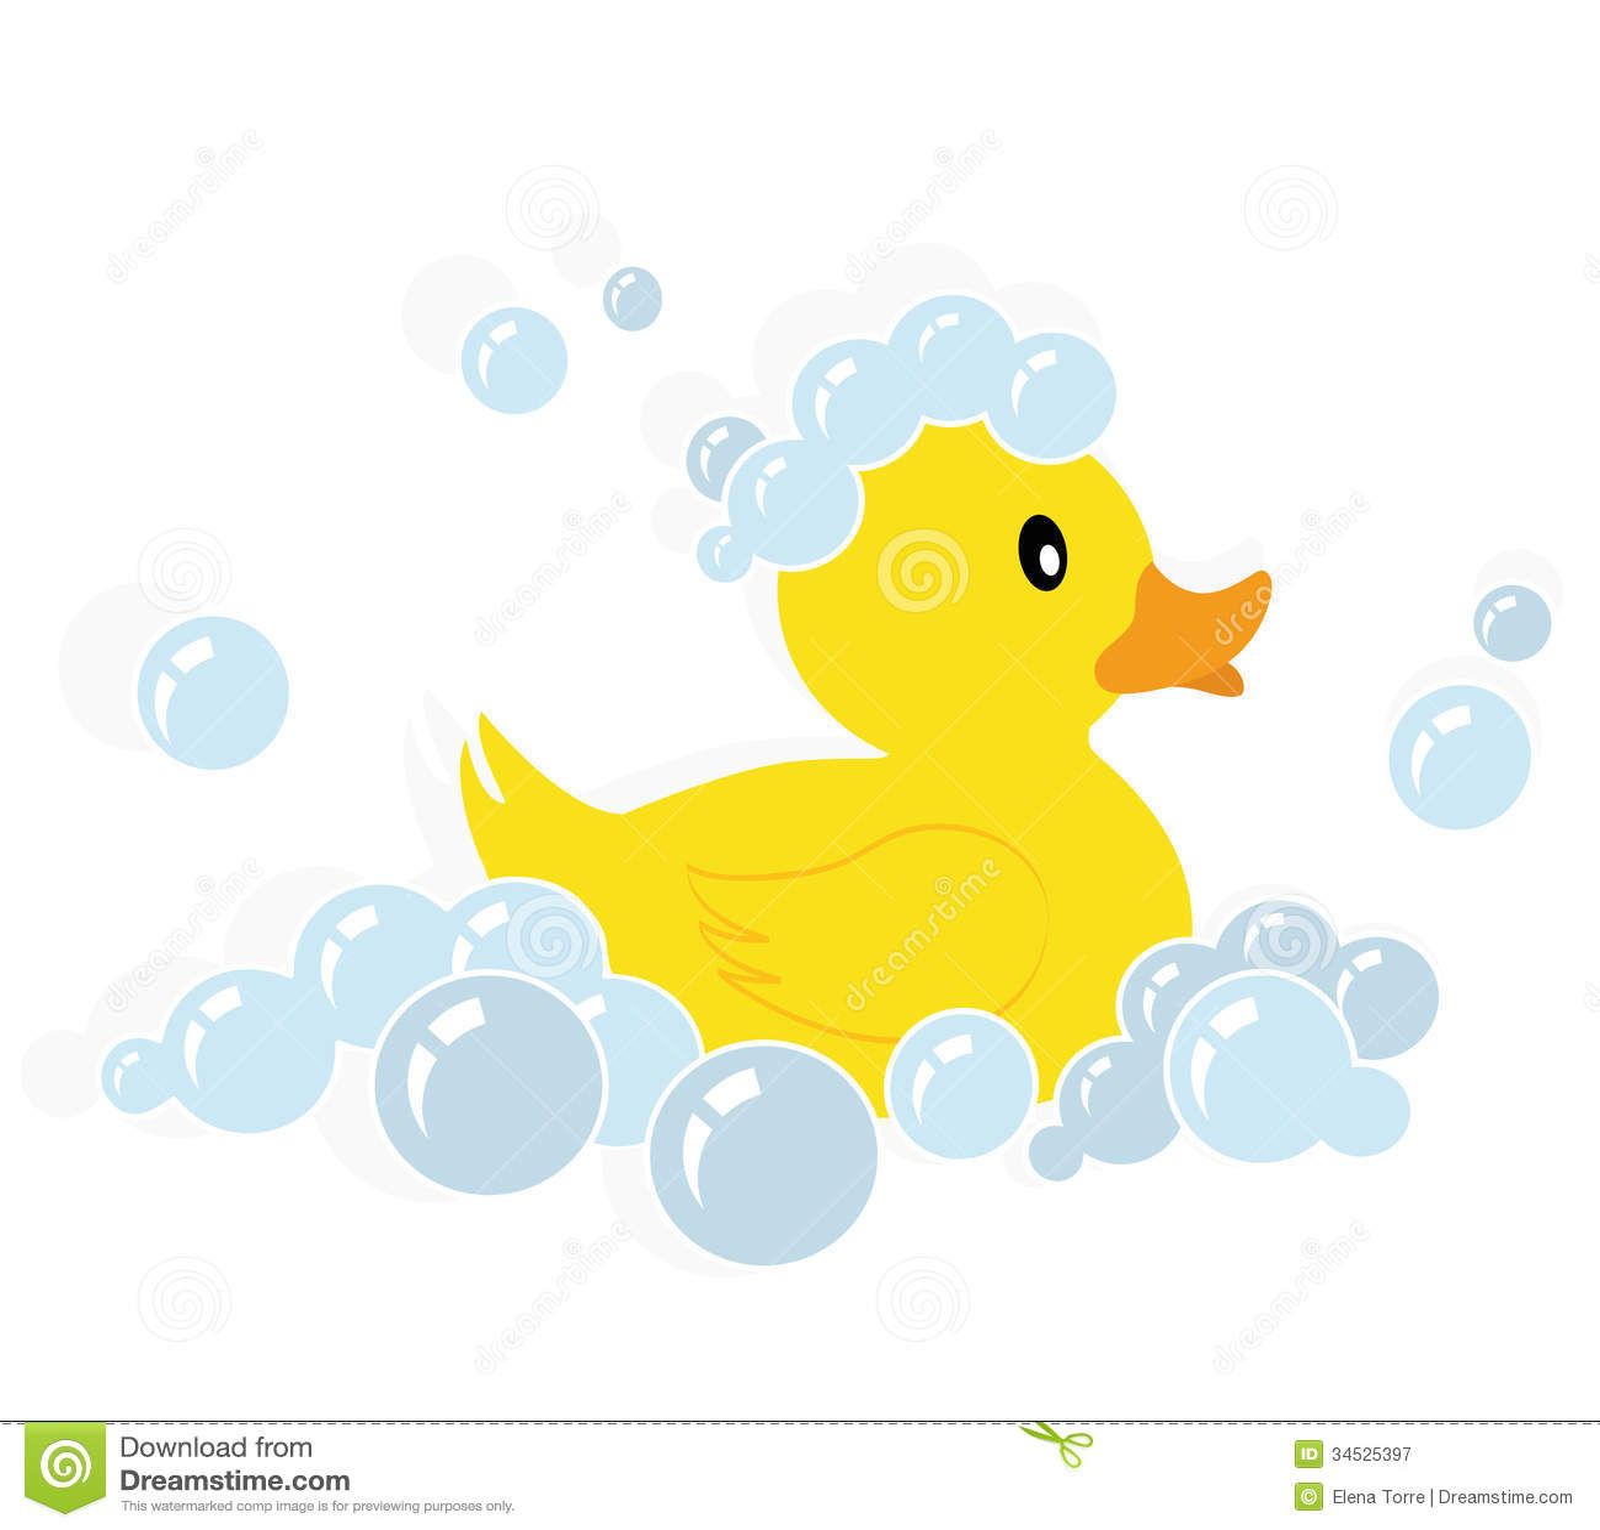 Rubber Duck Vector Stock Vector Illustration Of Duckling